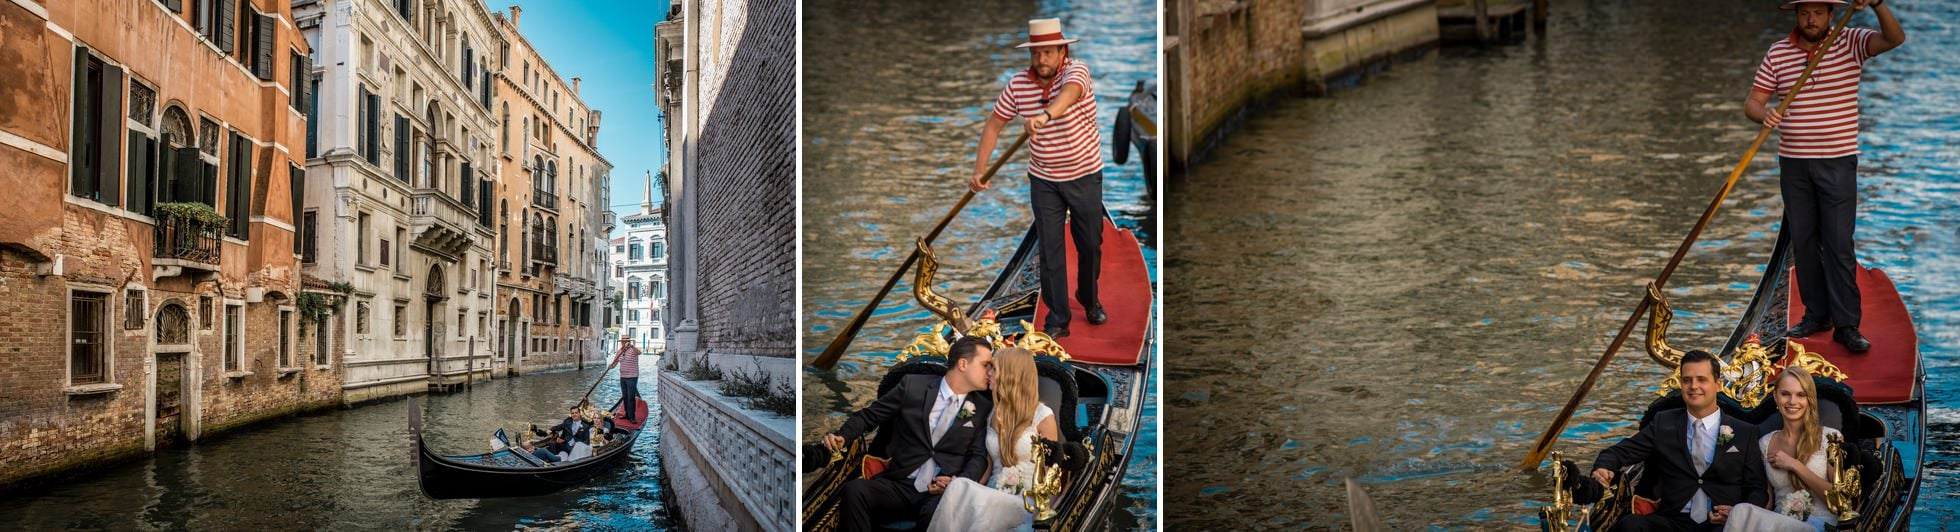 fotografo matrimonio venezia gondole